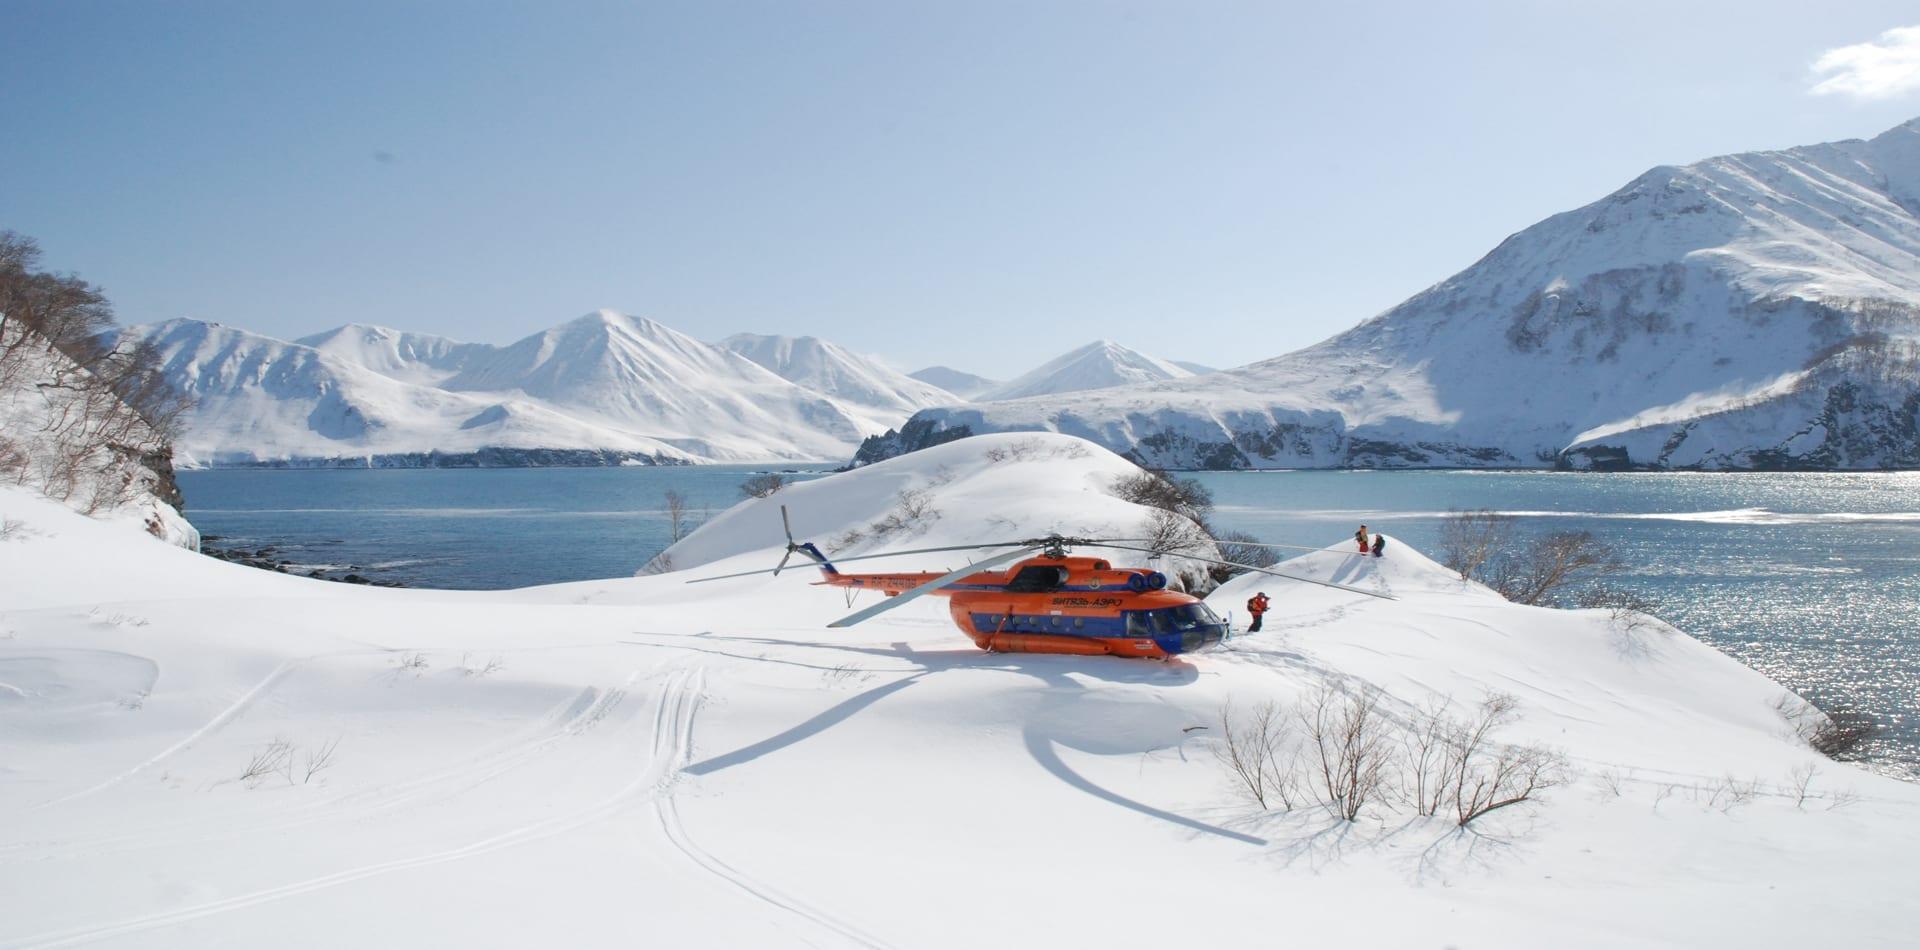 Heli skiing in Kamchatka volcanos and lakes